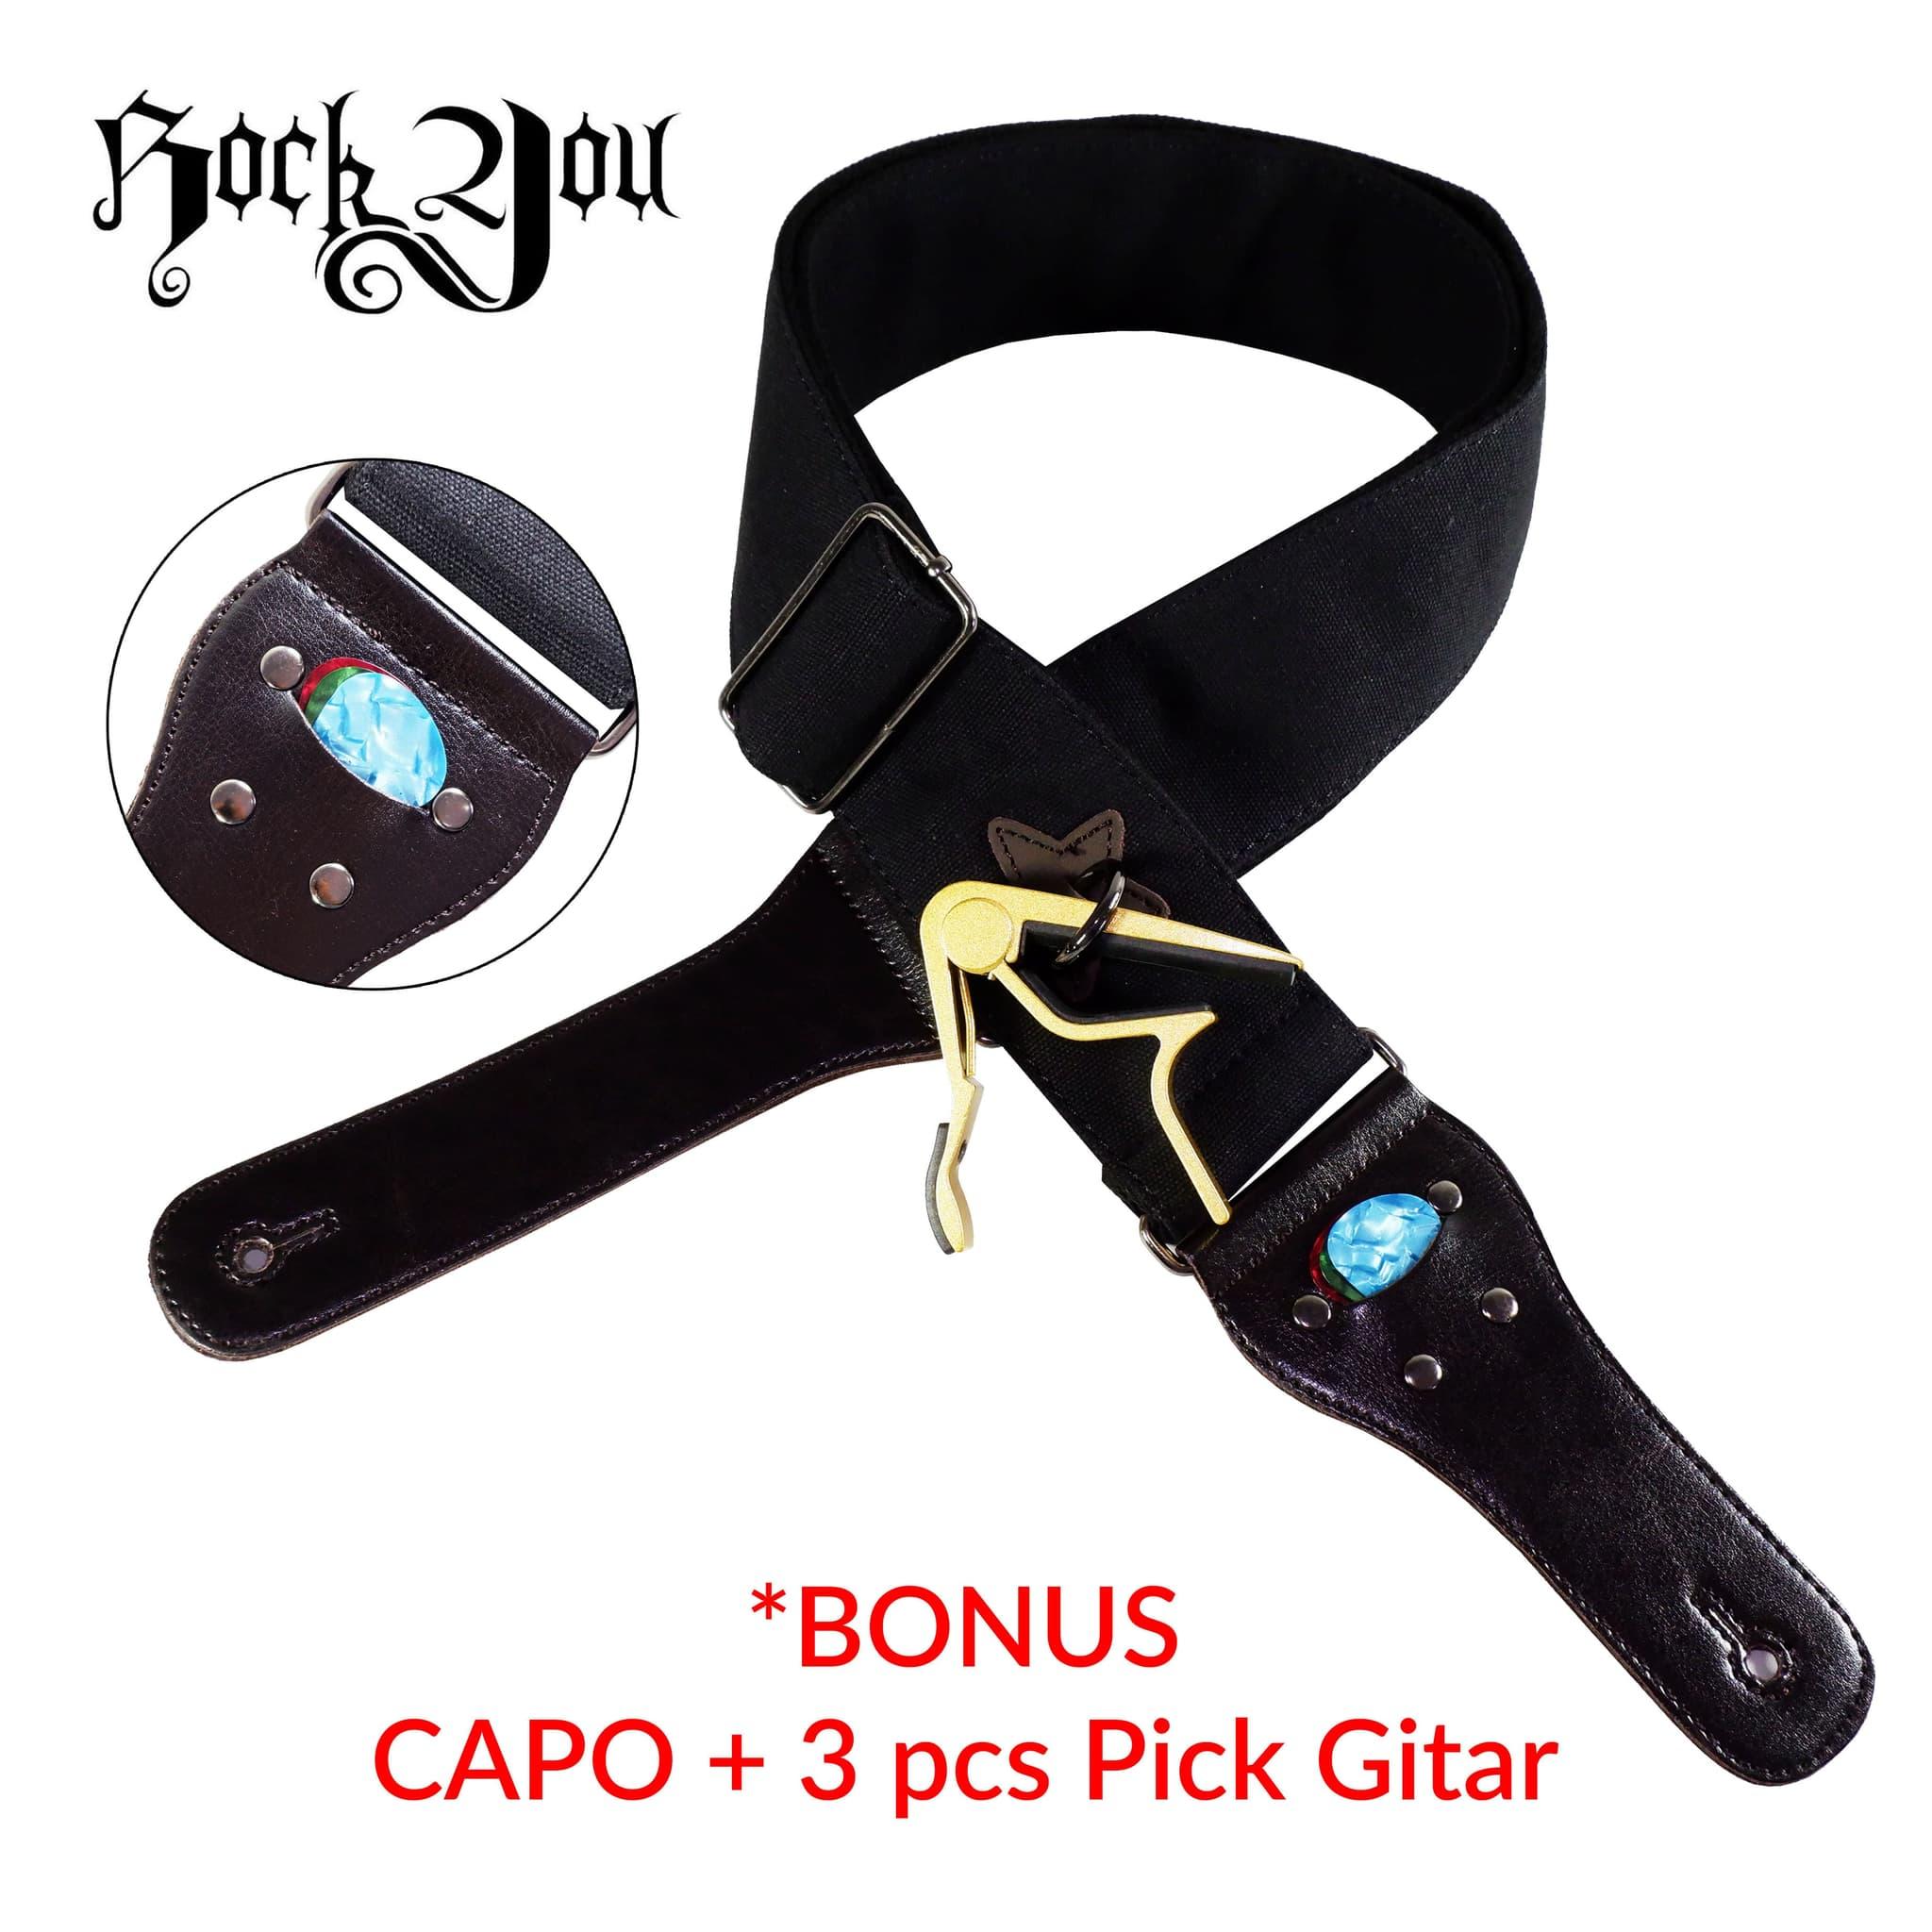 Strap Gitar Bonus Capo & Pick (3 pcs) Rock You S - 650H Tali Sabuk Gitar